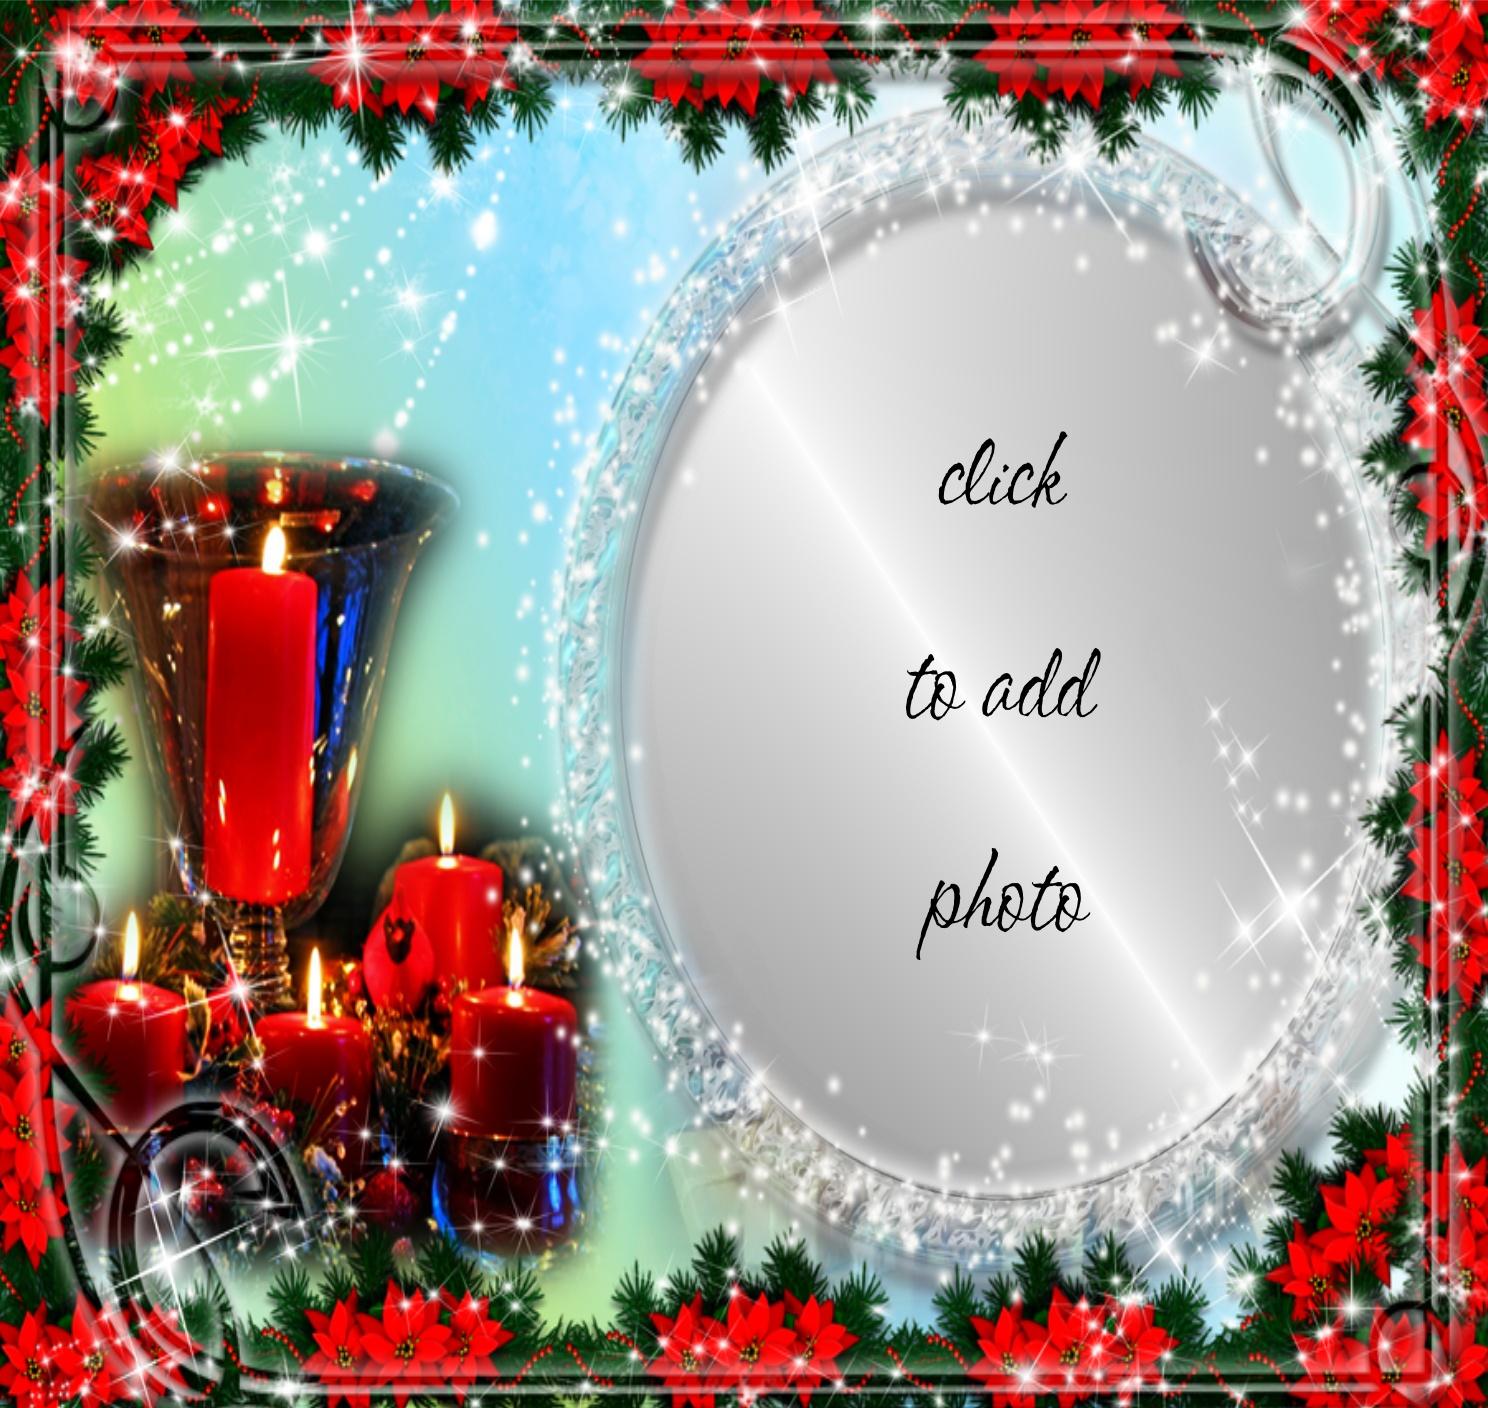 Imikimi Zo - Christma Frames - Merry #Christmas Imikimi Users ...